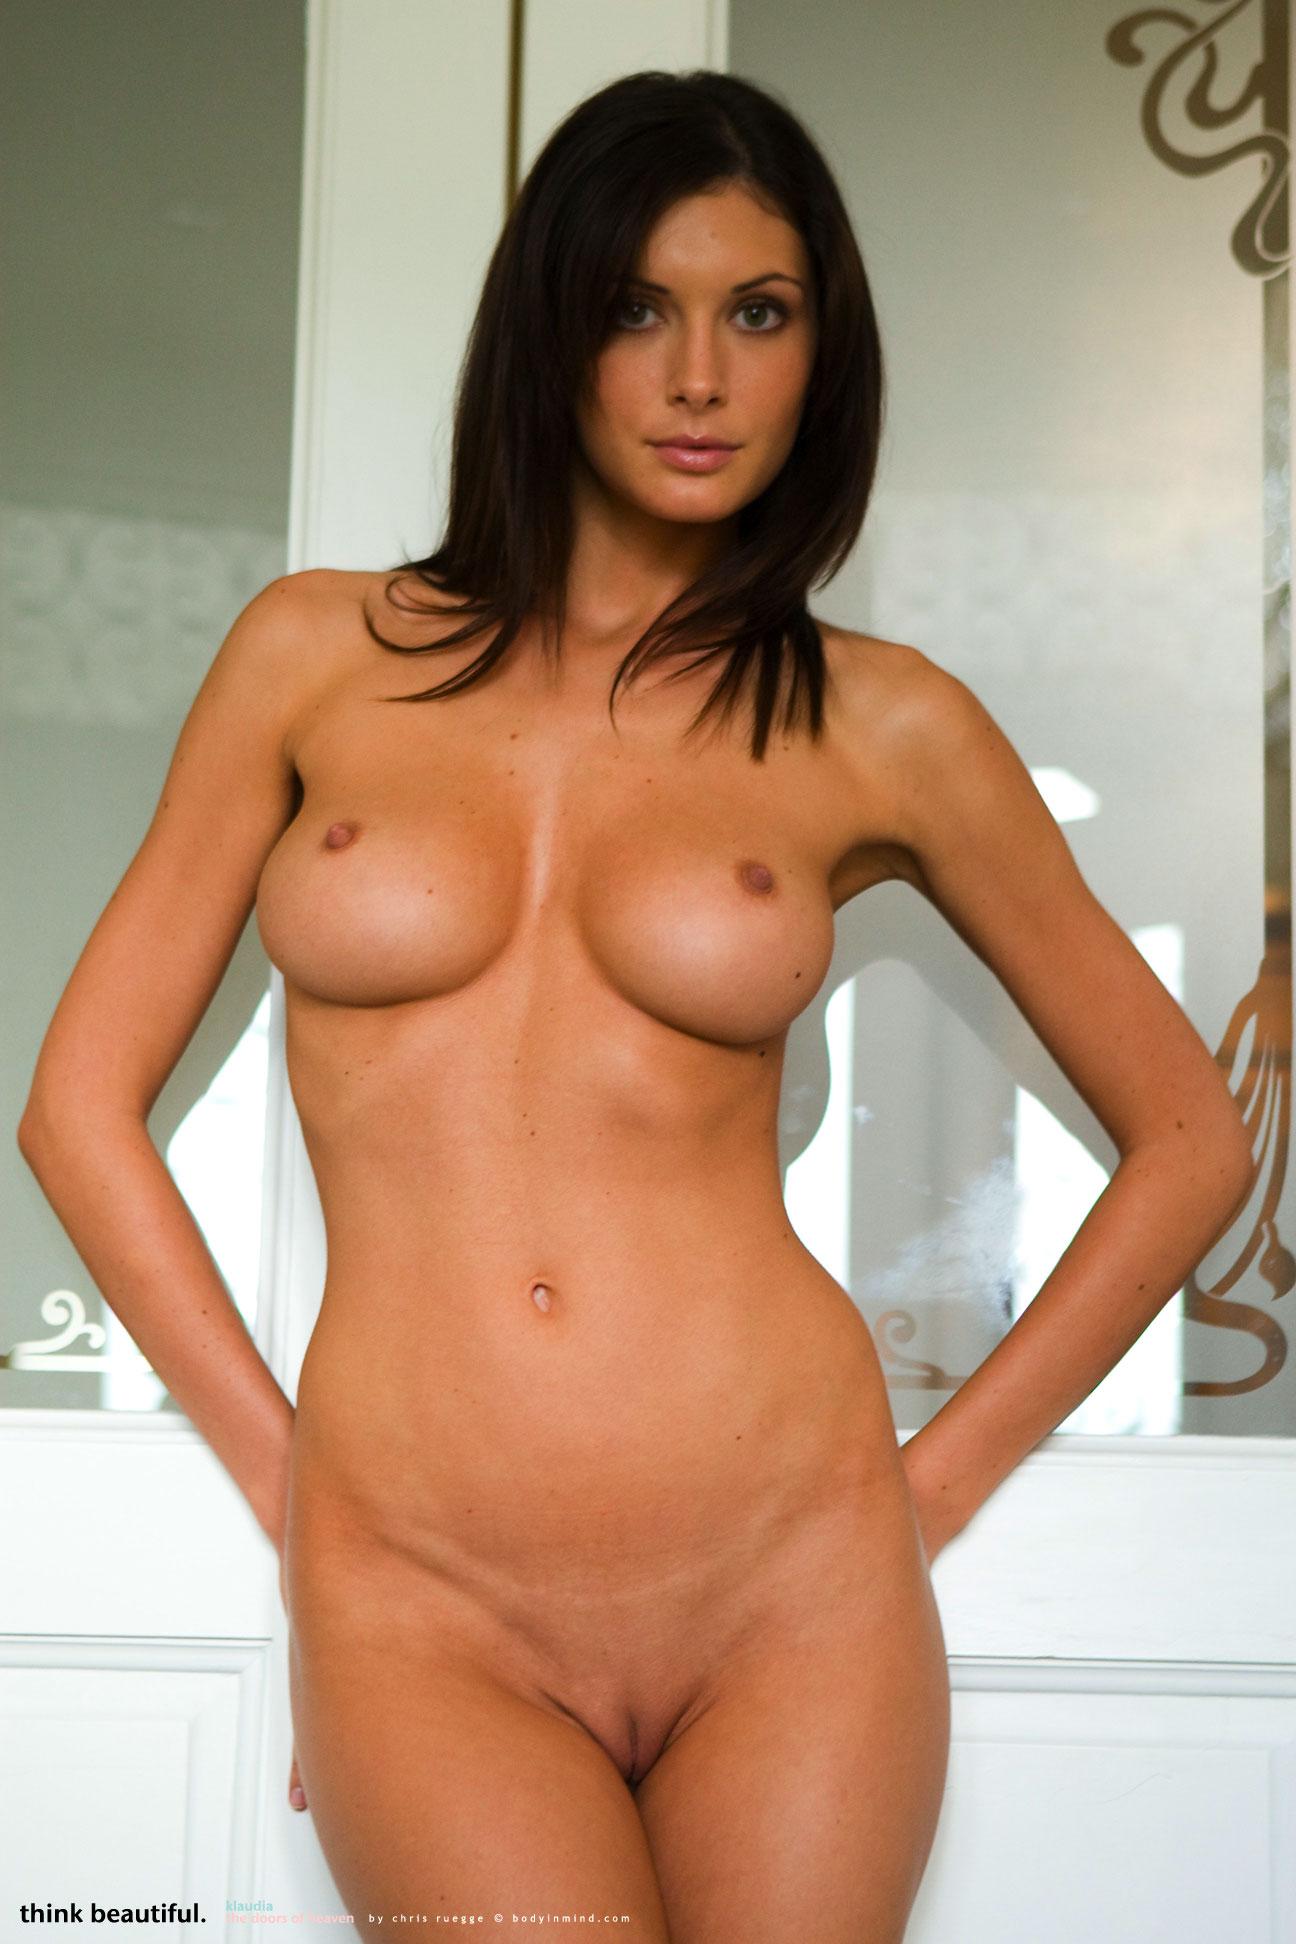 Orsi Kocsis Topless photo 4